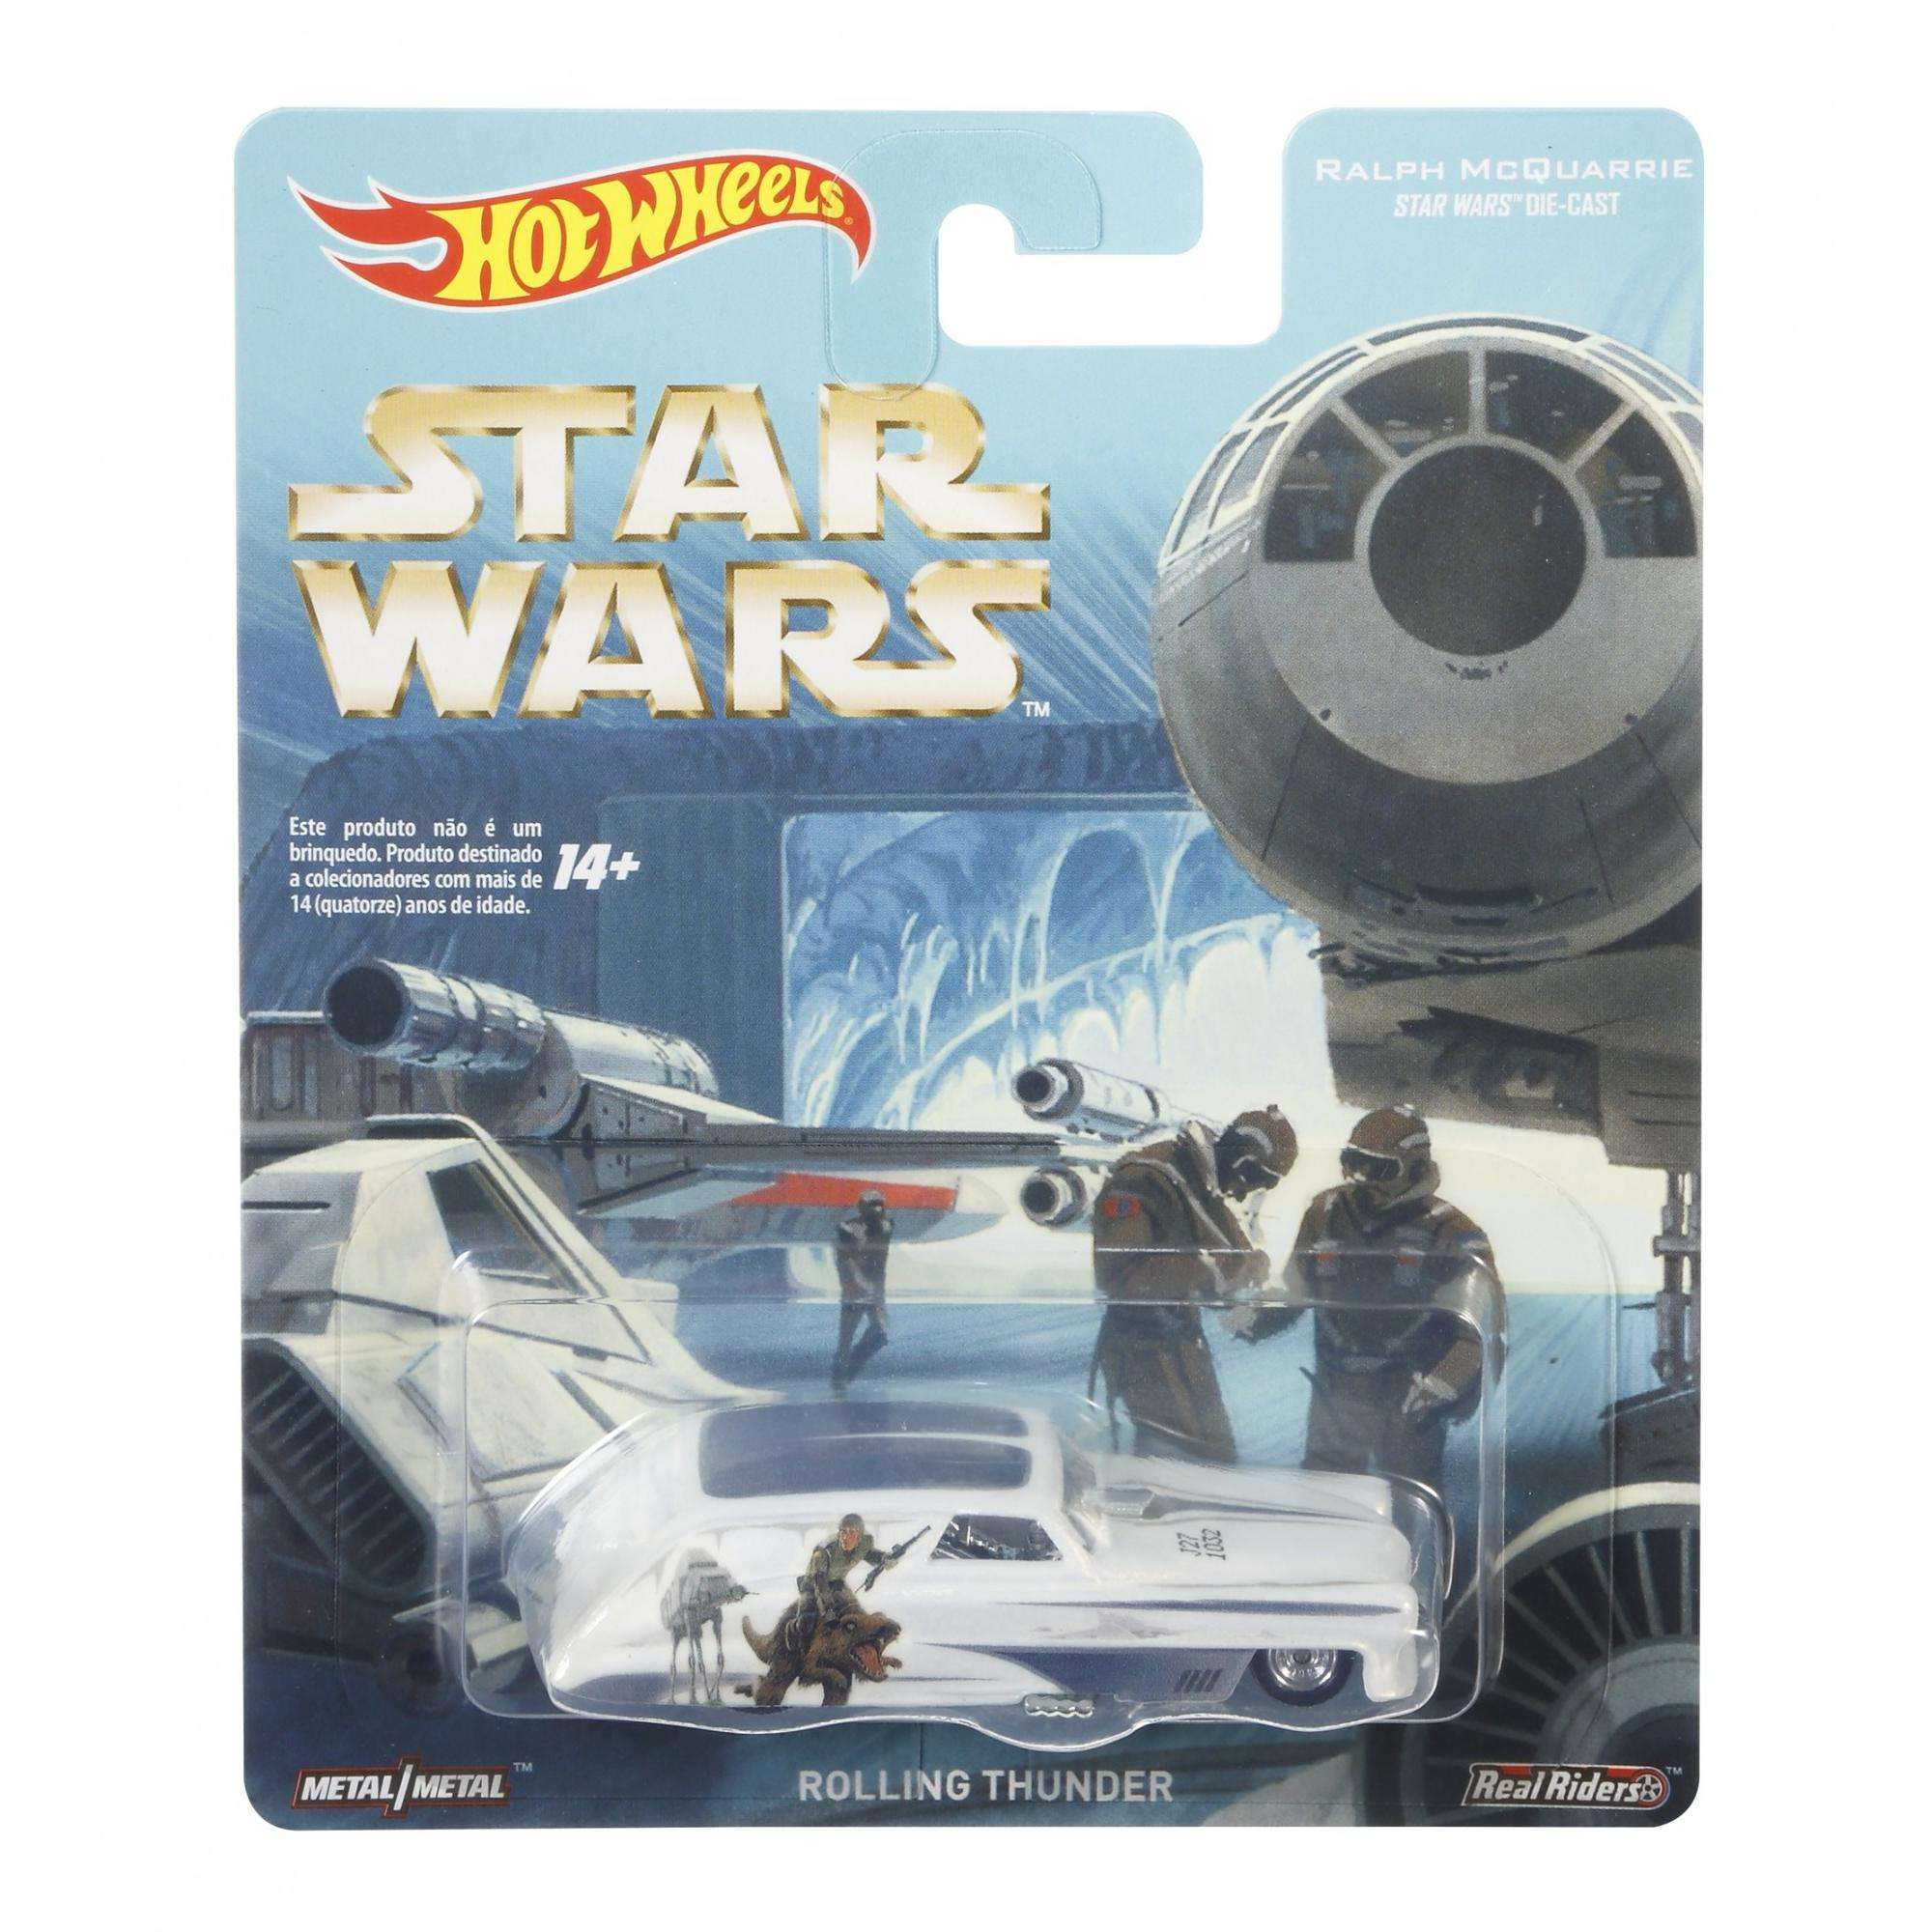 Hot Wheels Cultura Pop Star Wars Rolling Thunder Real Riders!!!